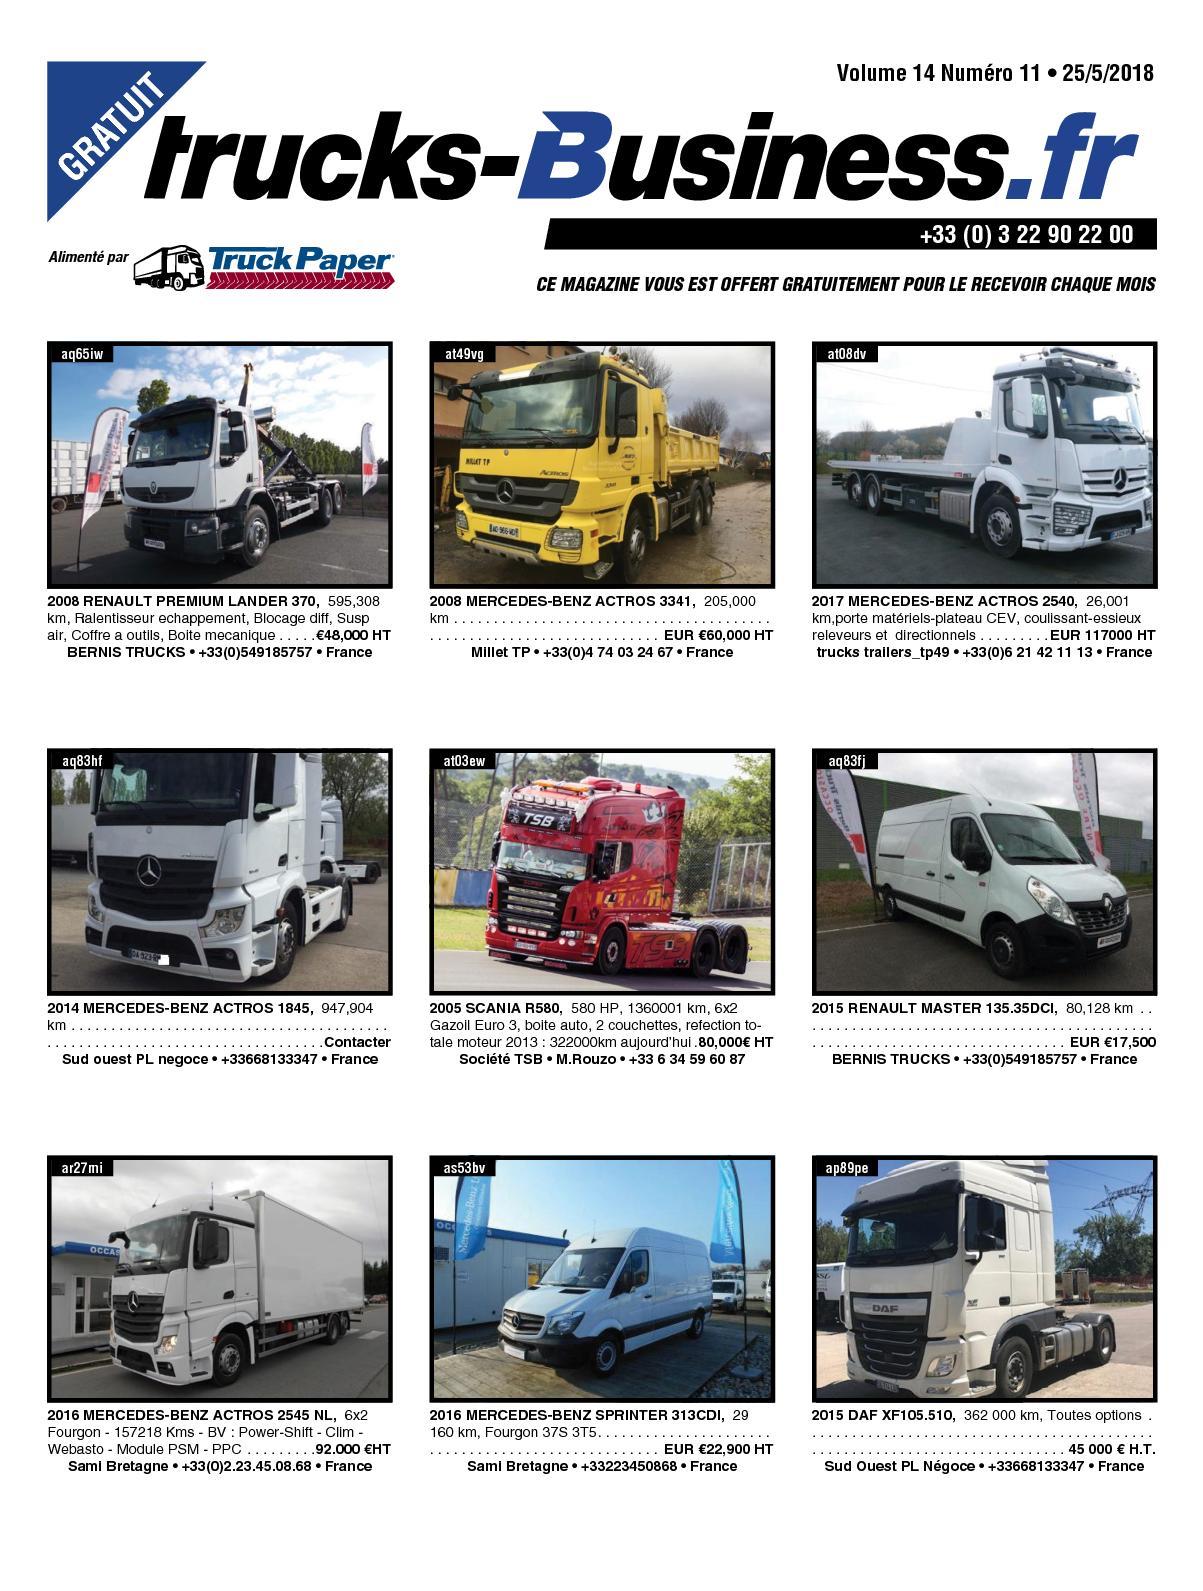 Calaméo Trucks Business Volume 14 Numéro 11 25052018